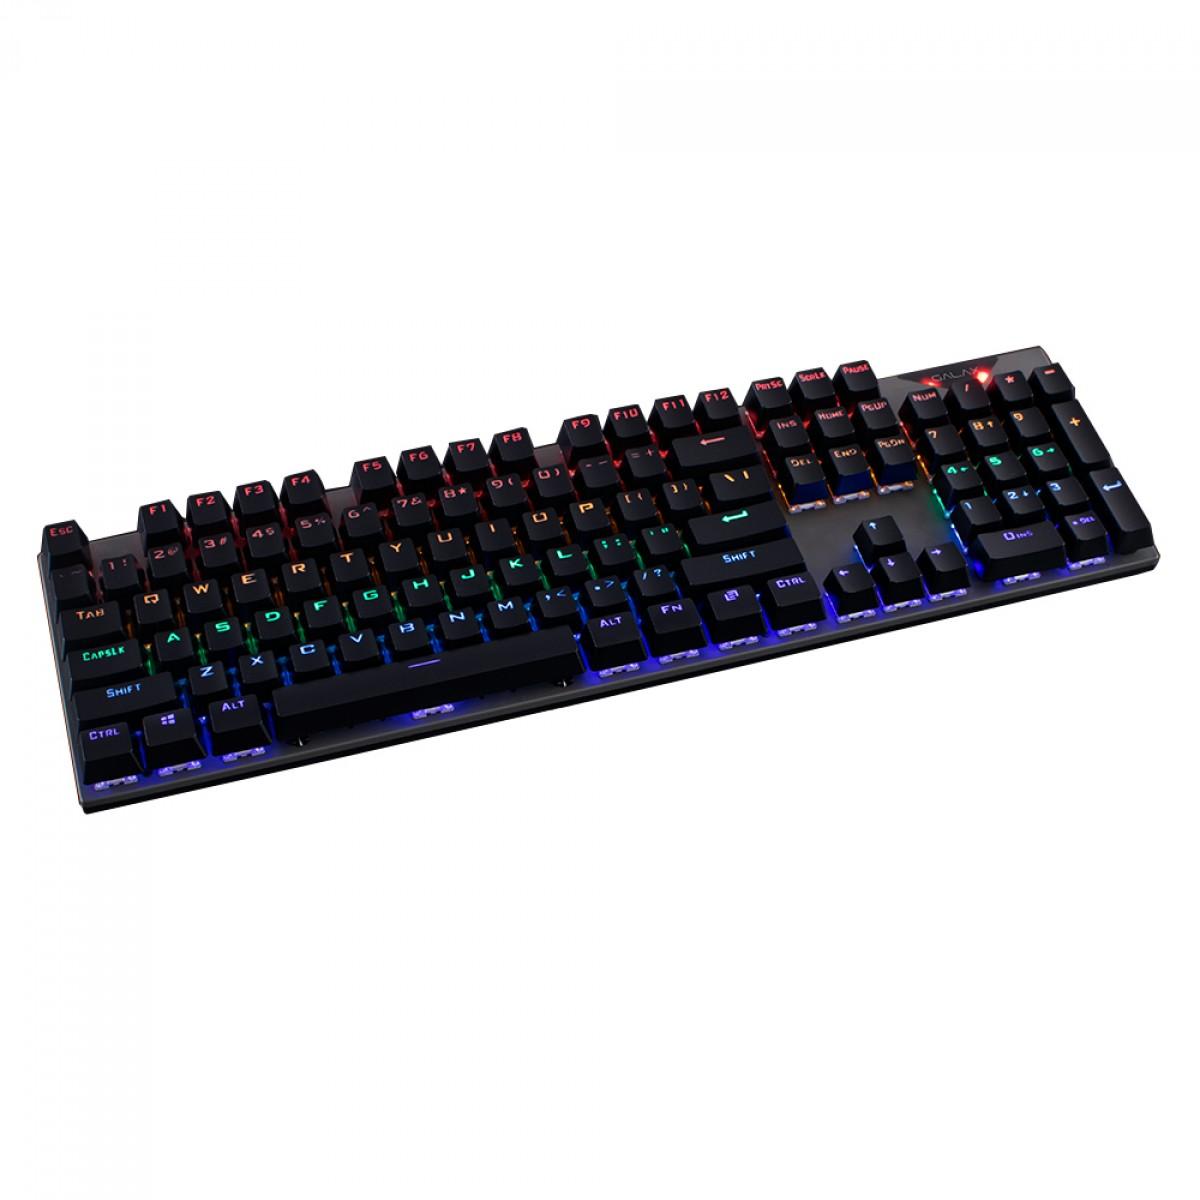 Teclado Gamer Mecânico Galax Stealth STL-03, Rainbow, Switch Blue, Black, KGS0314T1MR1BBK0